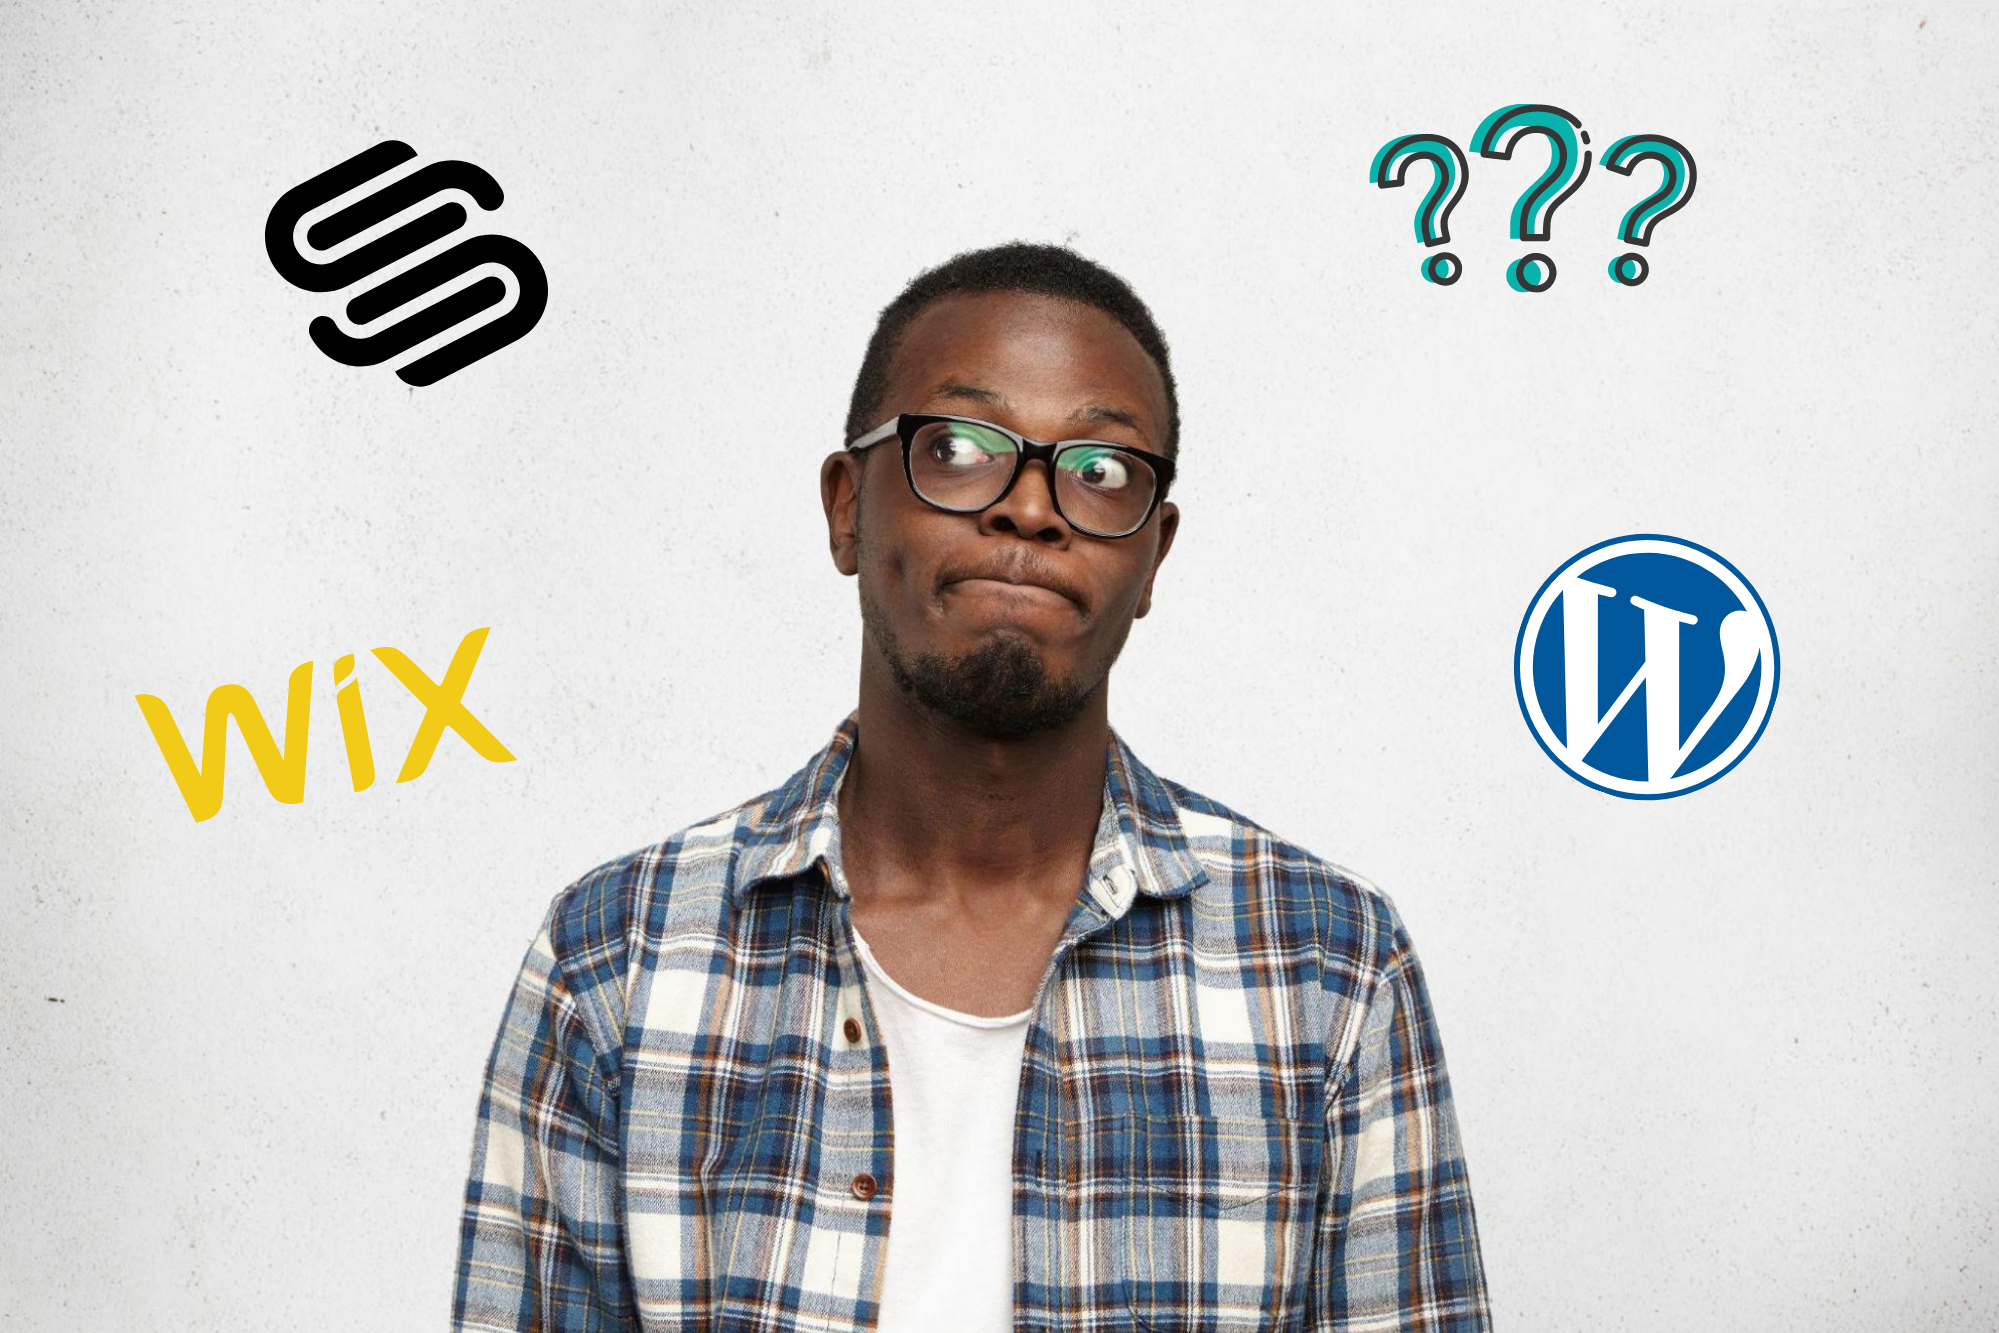 The Great Website Debate: WordPress vs. Wix vs. Squarespace